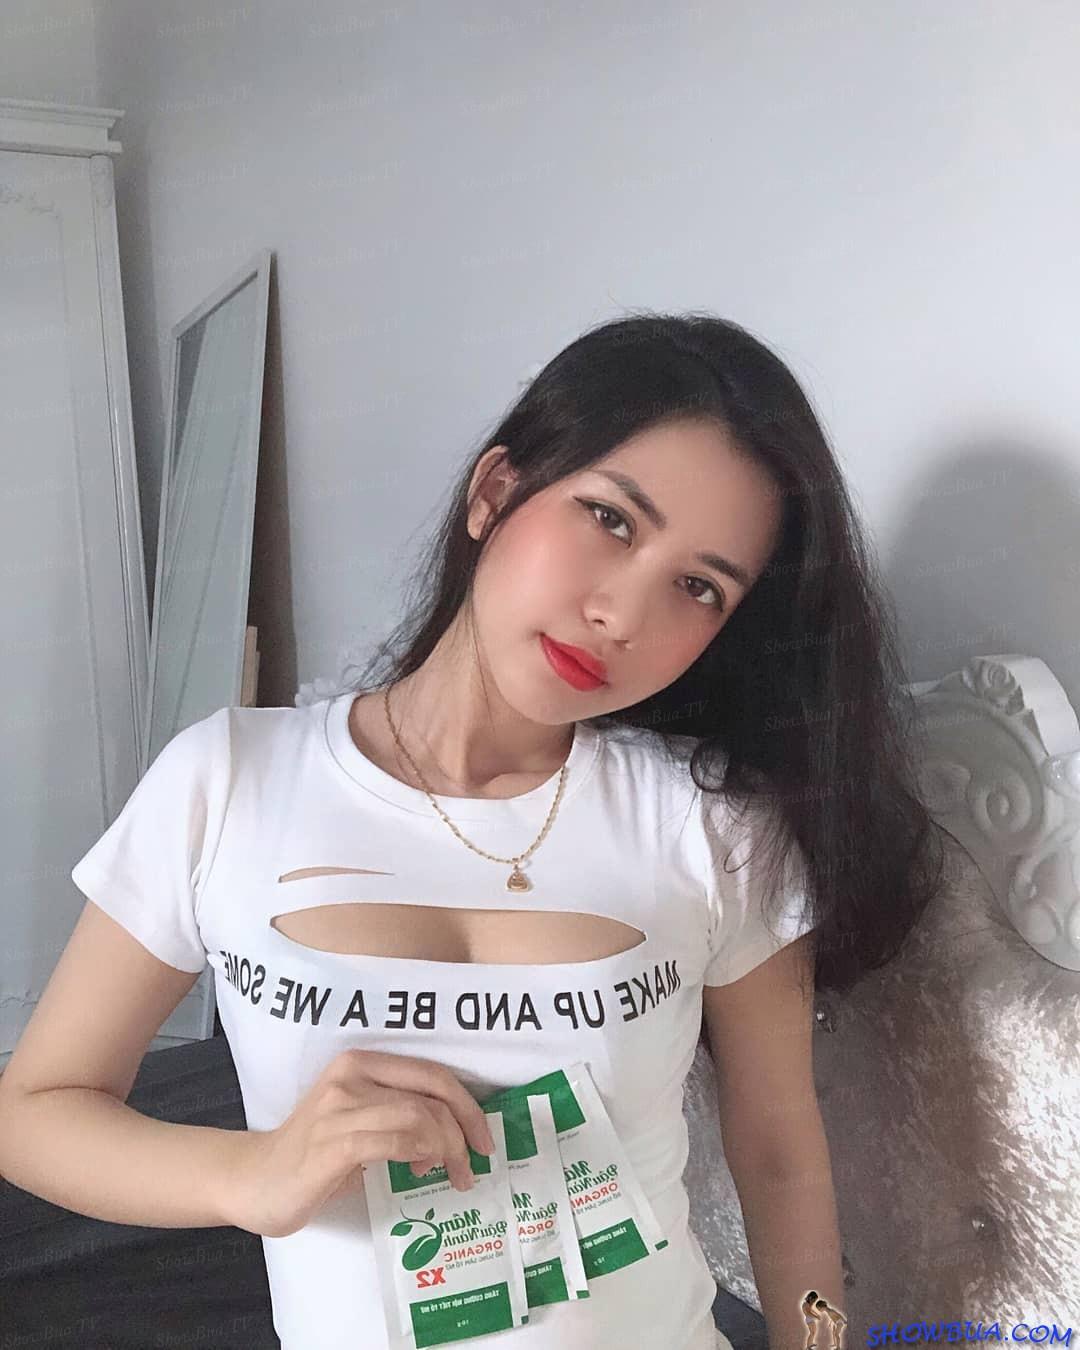 hayvnnet-nhung-nguoi-con-gai-ten-trinh-thuong-rat-dam-dang-10